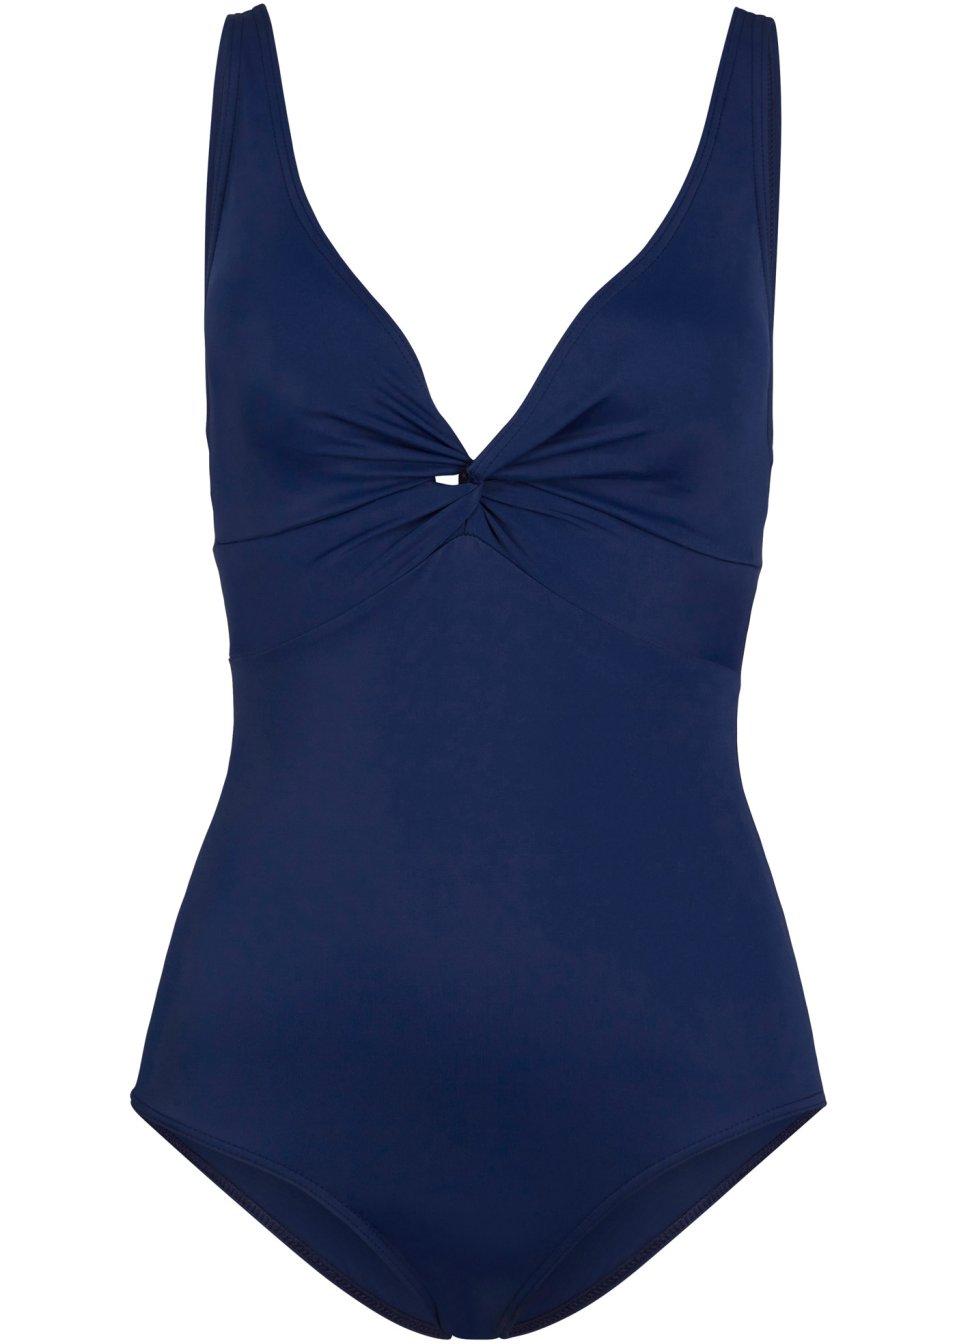 Eleganter Badeanzug aus nachhaltigem Econyl - dunkelblau yYDyg zYdmo